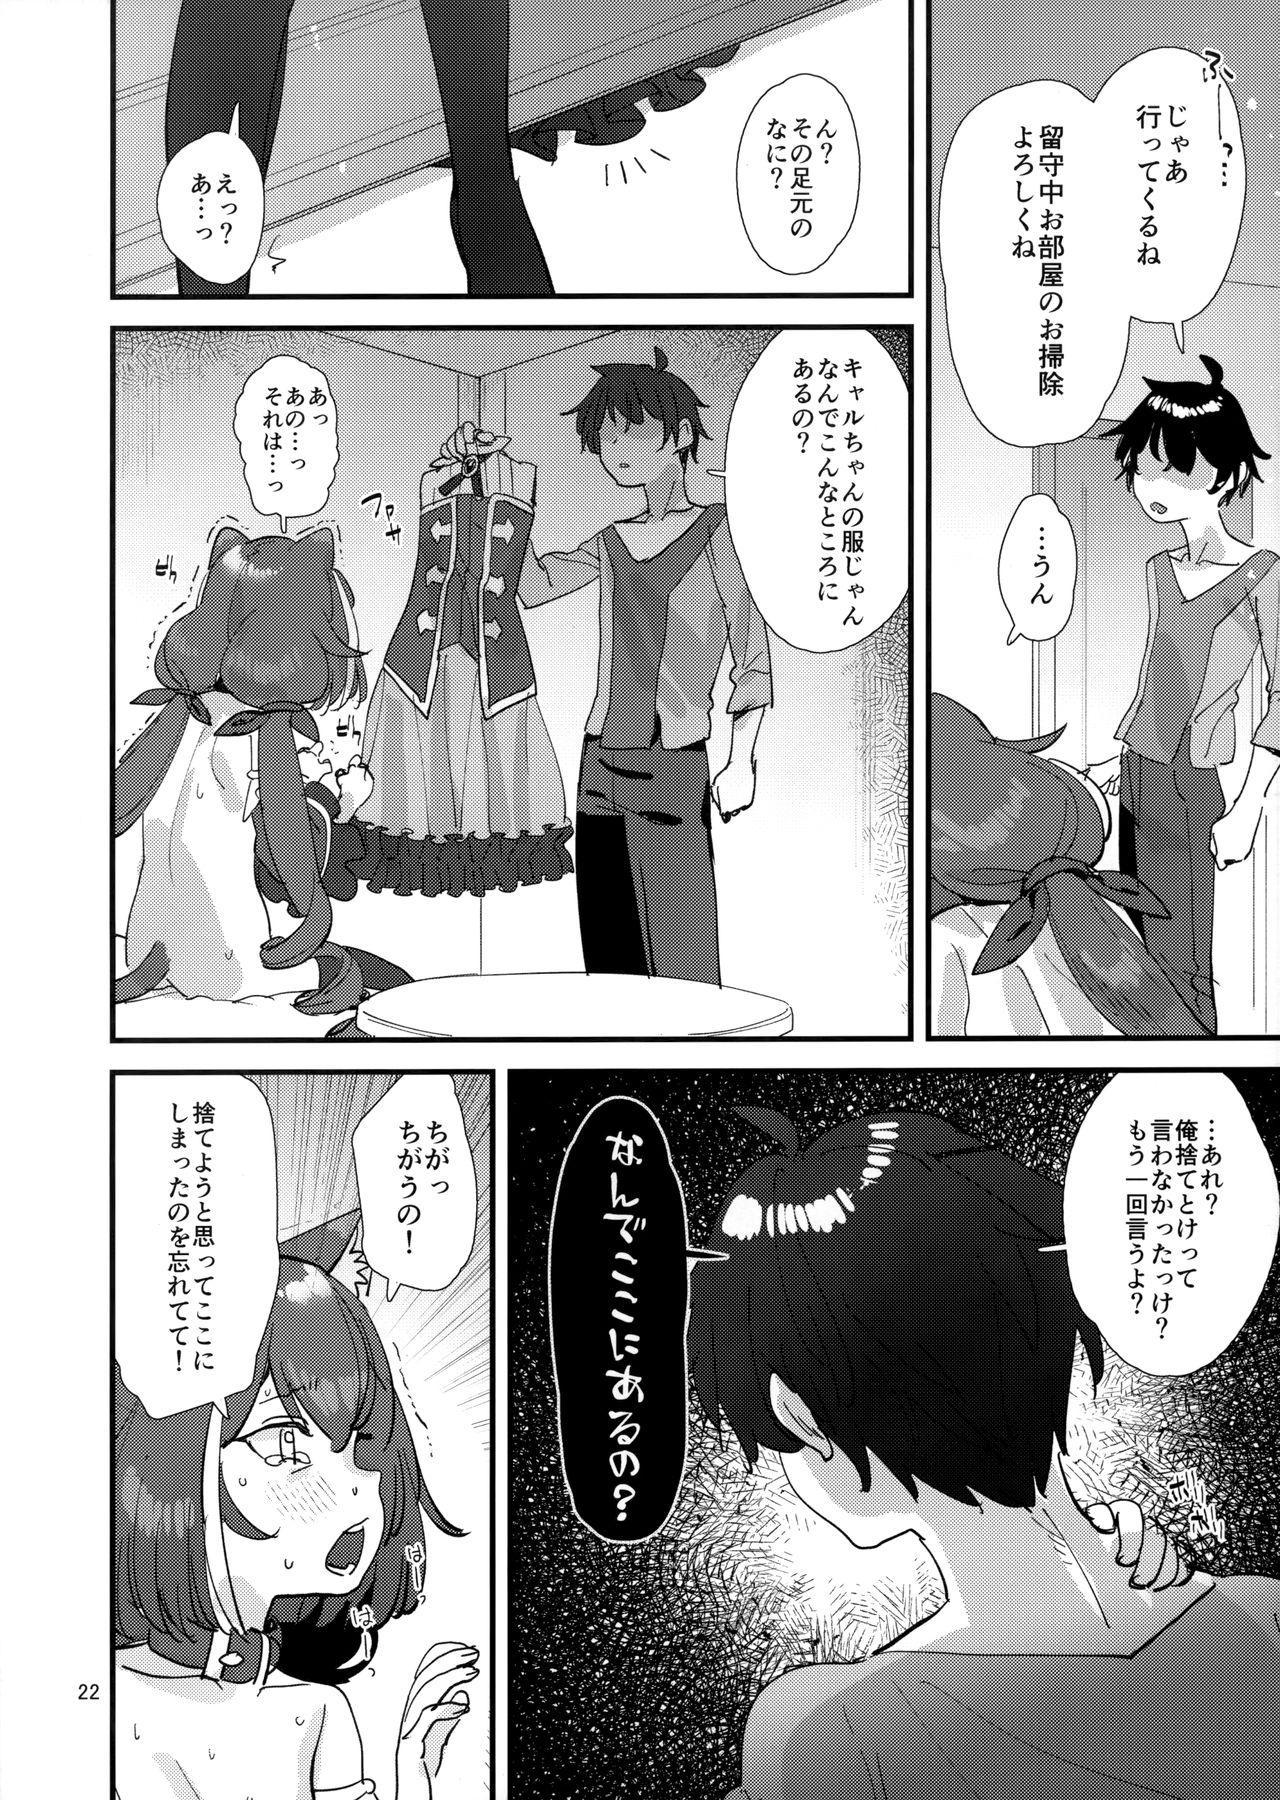 Ohayou, Kyaru-chan 20